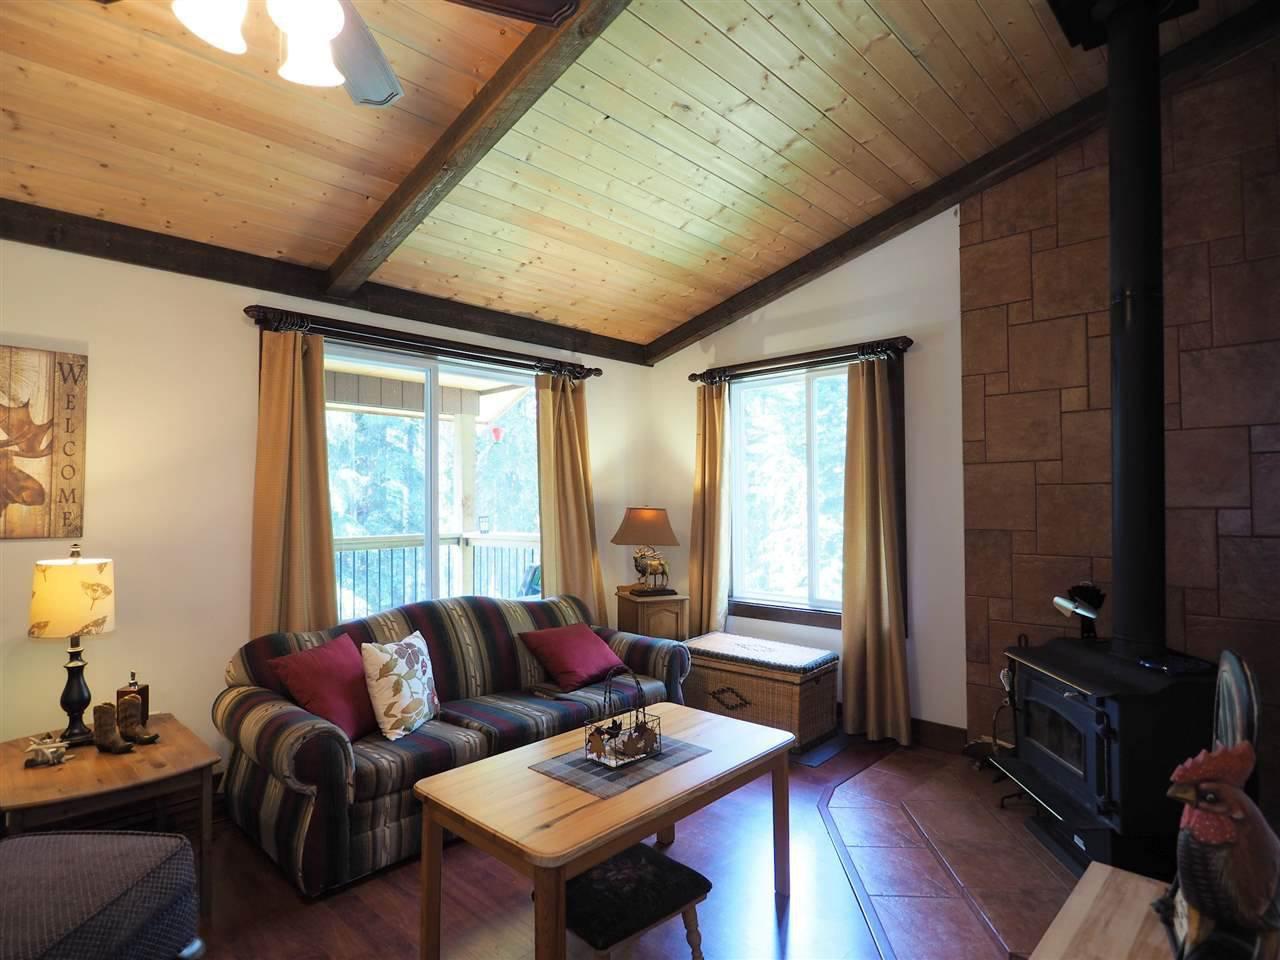 Photo 12: Photos: 8222 CENTENNIAL Road in Bridge Lake: Bridge Lake/Sheridan Lake House for sale (100 Mile House (Zone 10))  : MLS®# R2457362